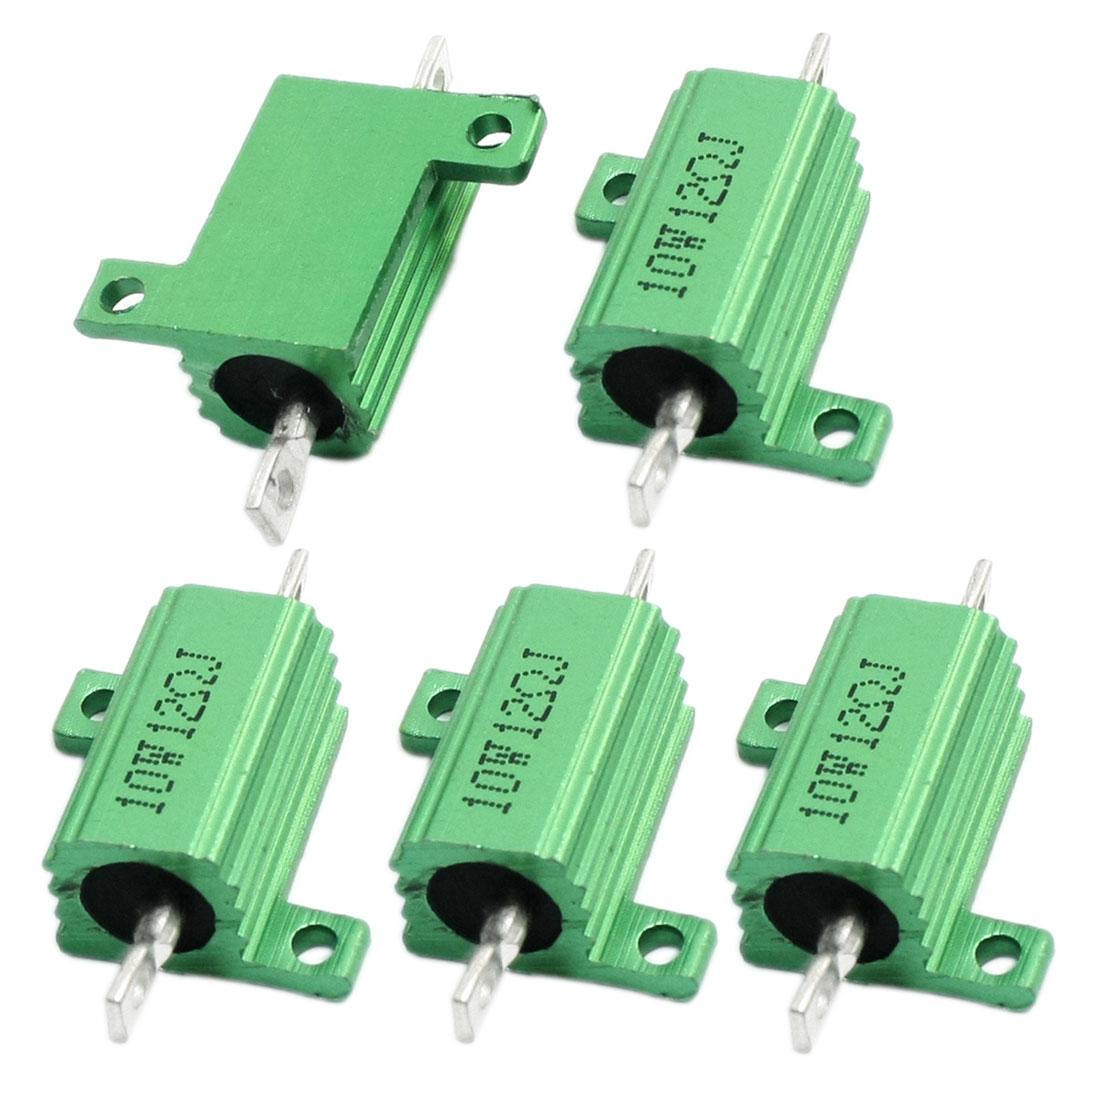 5Pcs 12 Ohm 5% 10W Aluminium Clad Heatsink Wirewound Power Resistors